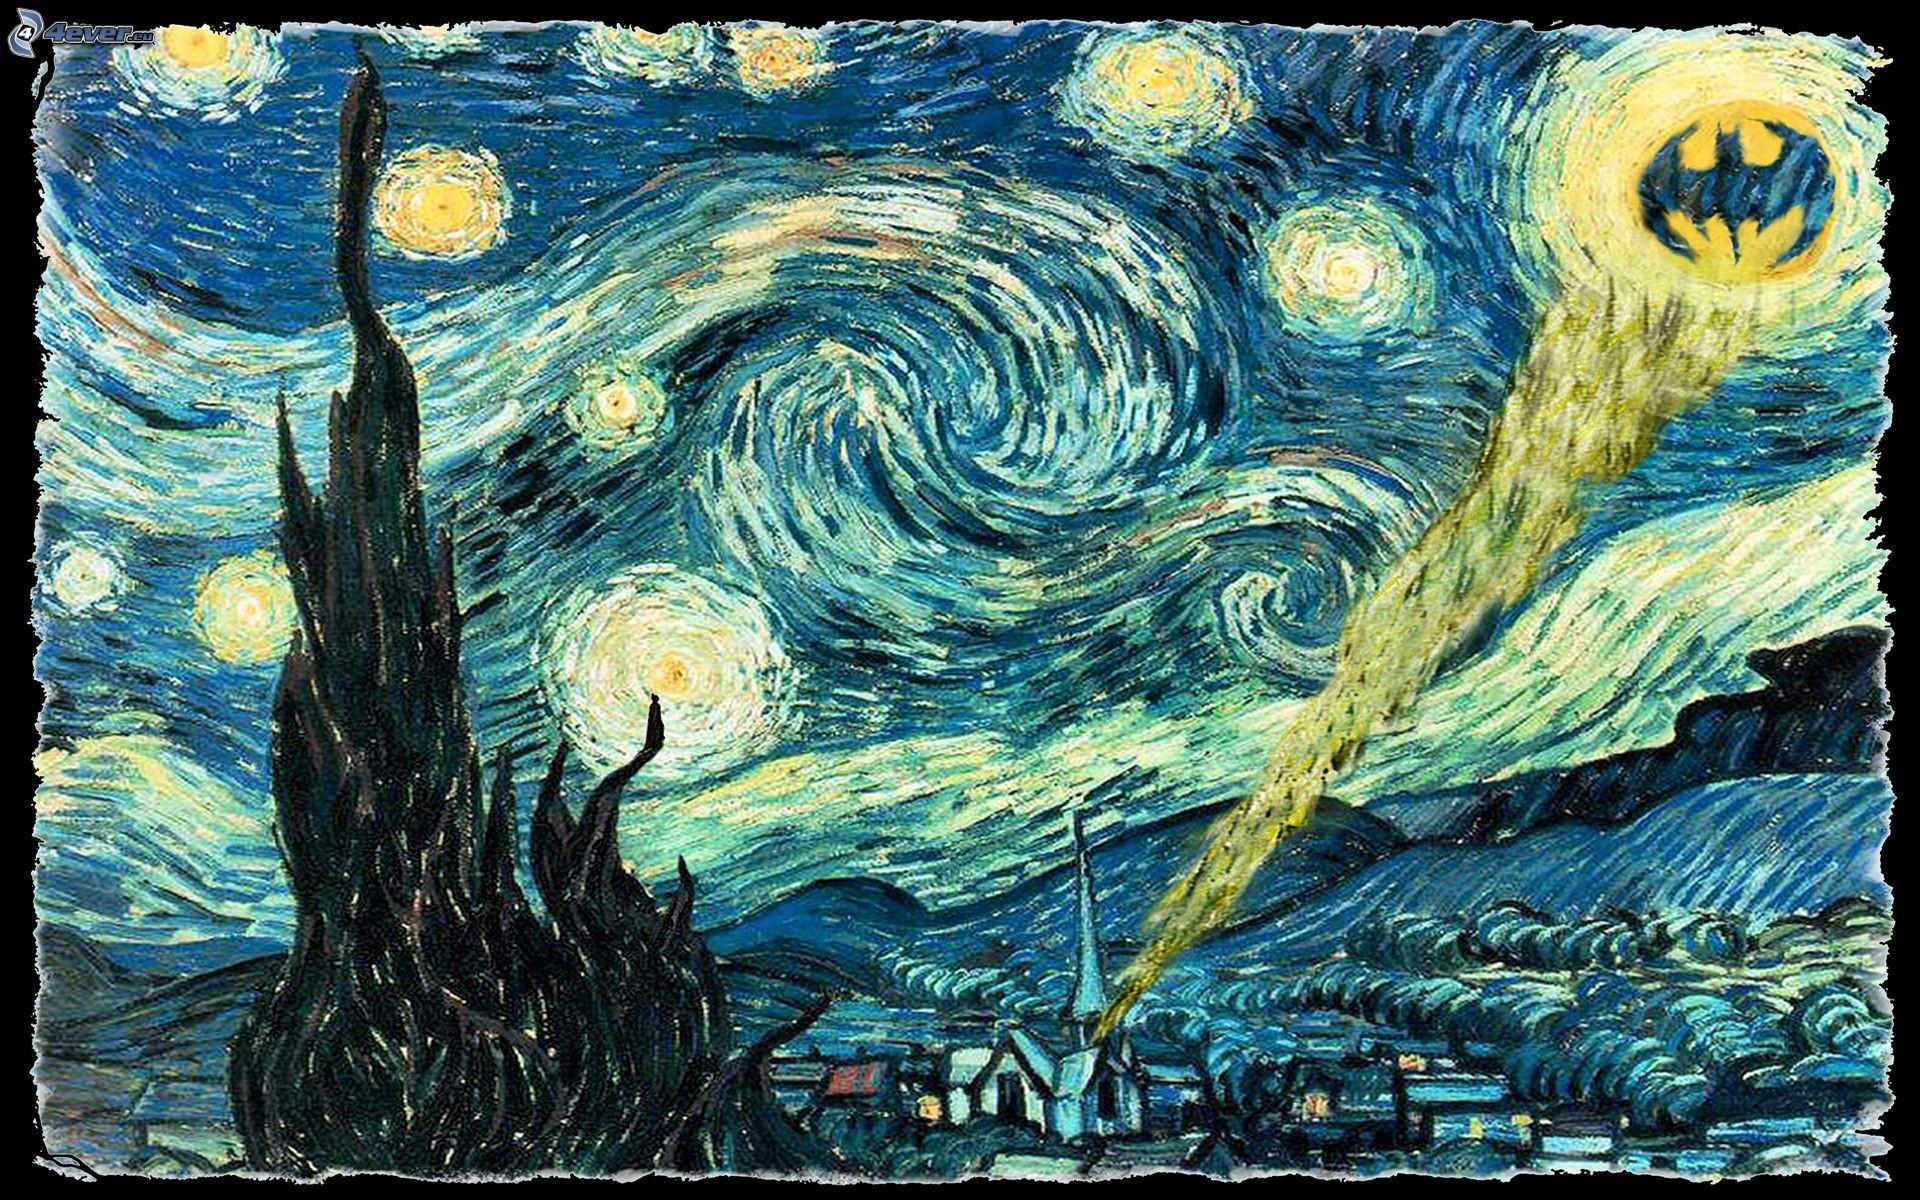 Doctor Who Van Gogh Wallpaper 55 Images